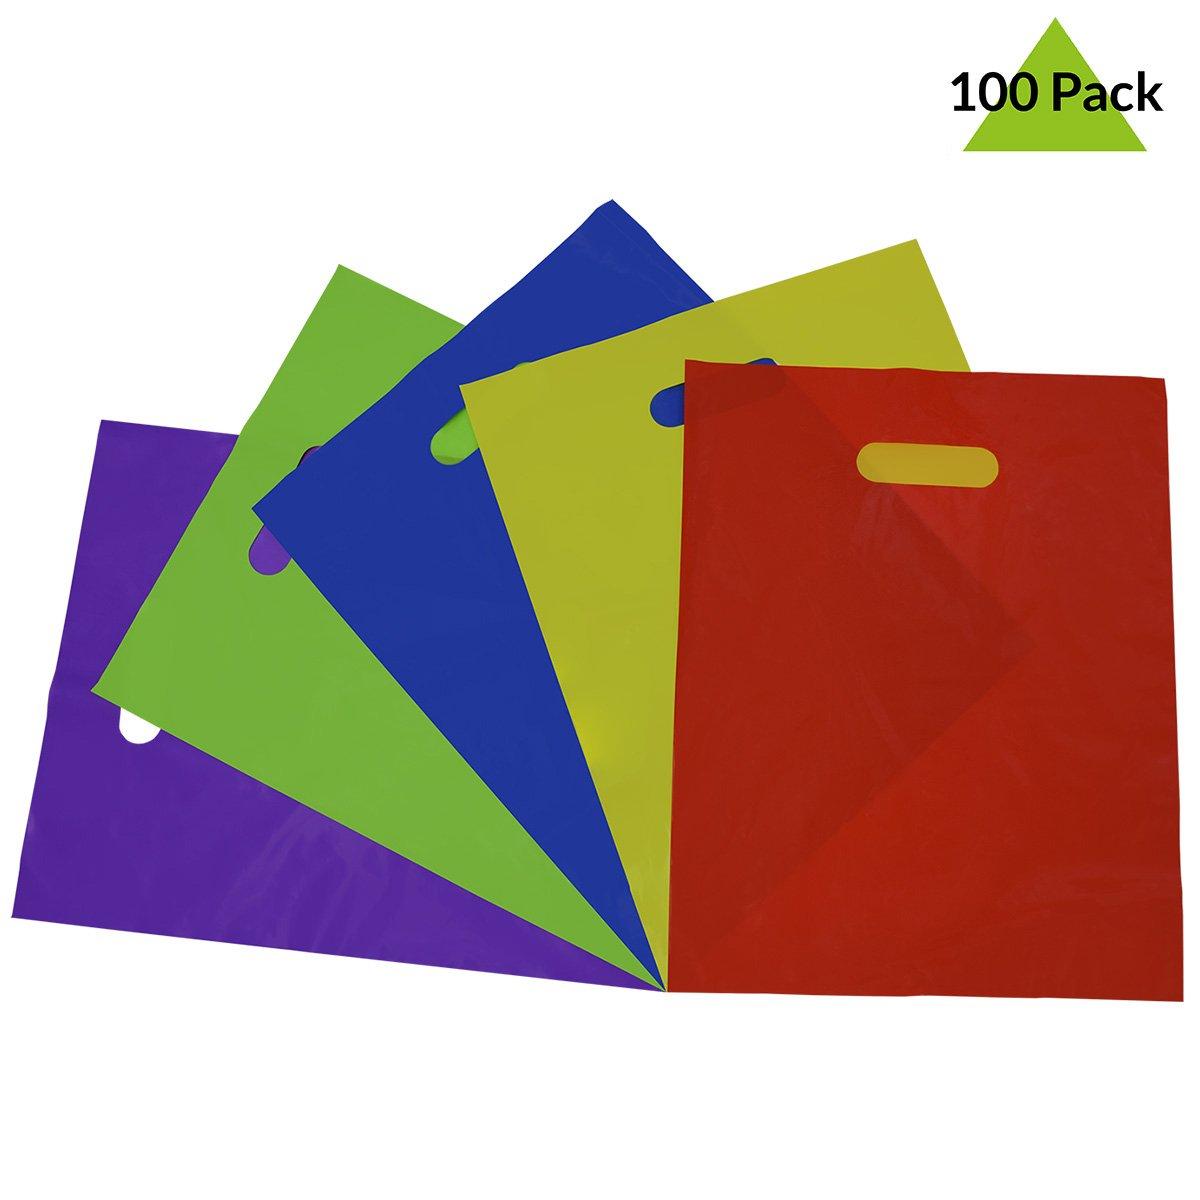 Prime Line Packaging 100 Pcs. 12x15 Thick 2 Mil Multi Color Plastic Merchandise Bags with Die Cut Handles, Plastic Shopping Bags, Party Favor Bags, Gift Bags Bulk